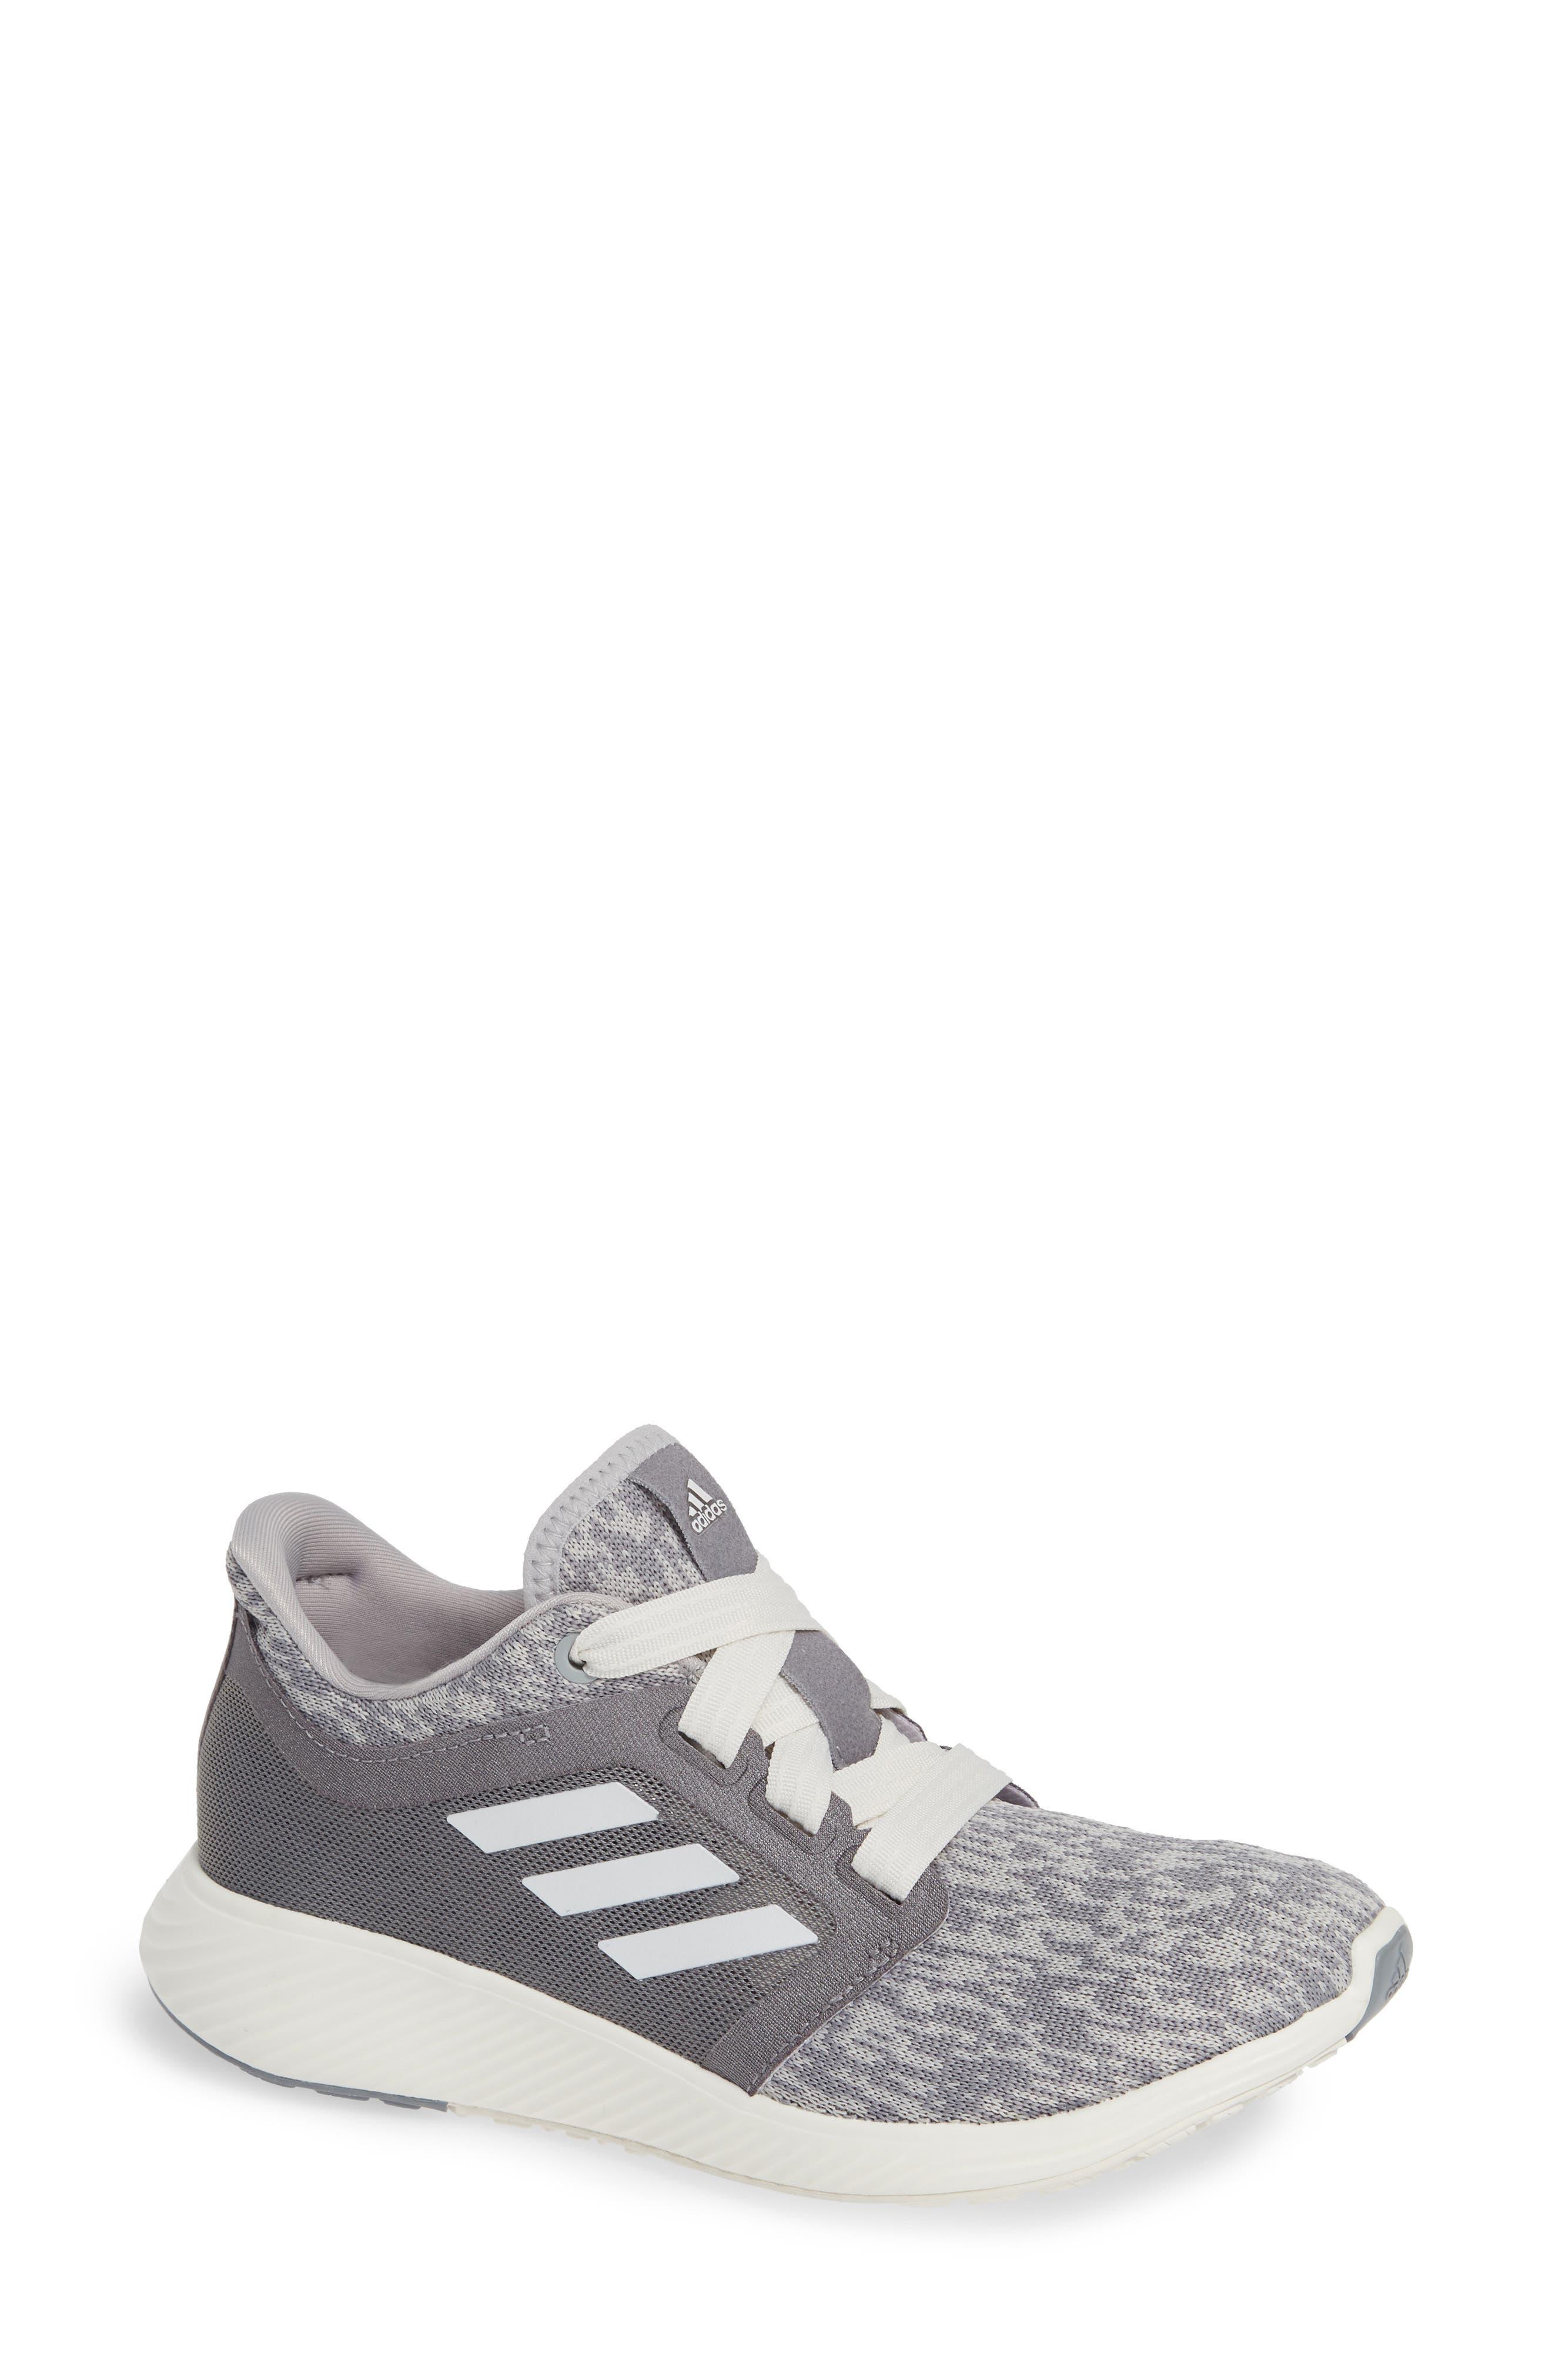 Adidas Edge Lux 3 Running Shoe, / 4 Men